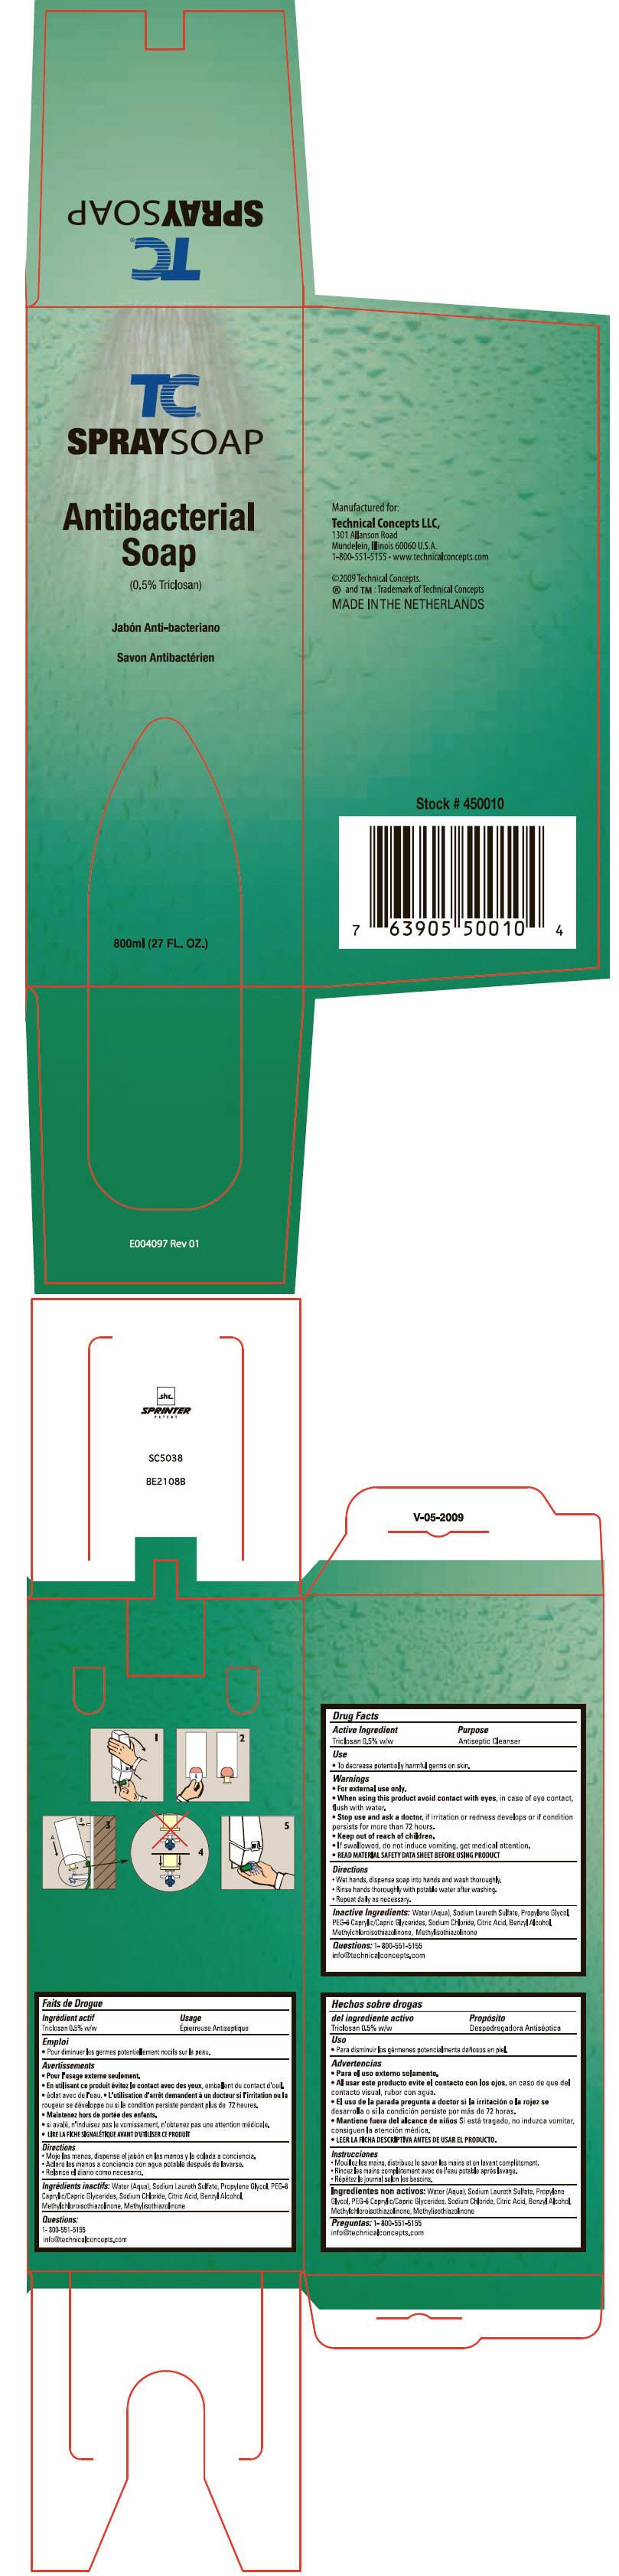 Principal Display Panel - 800 ml Carton